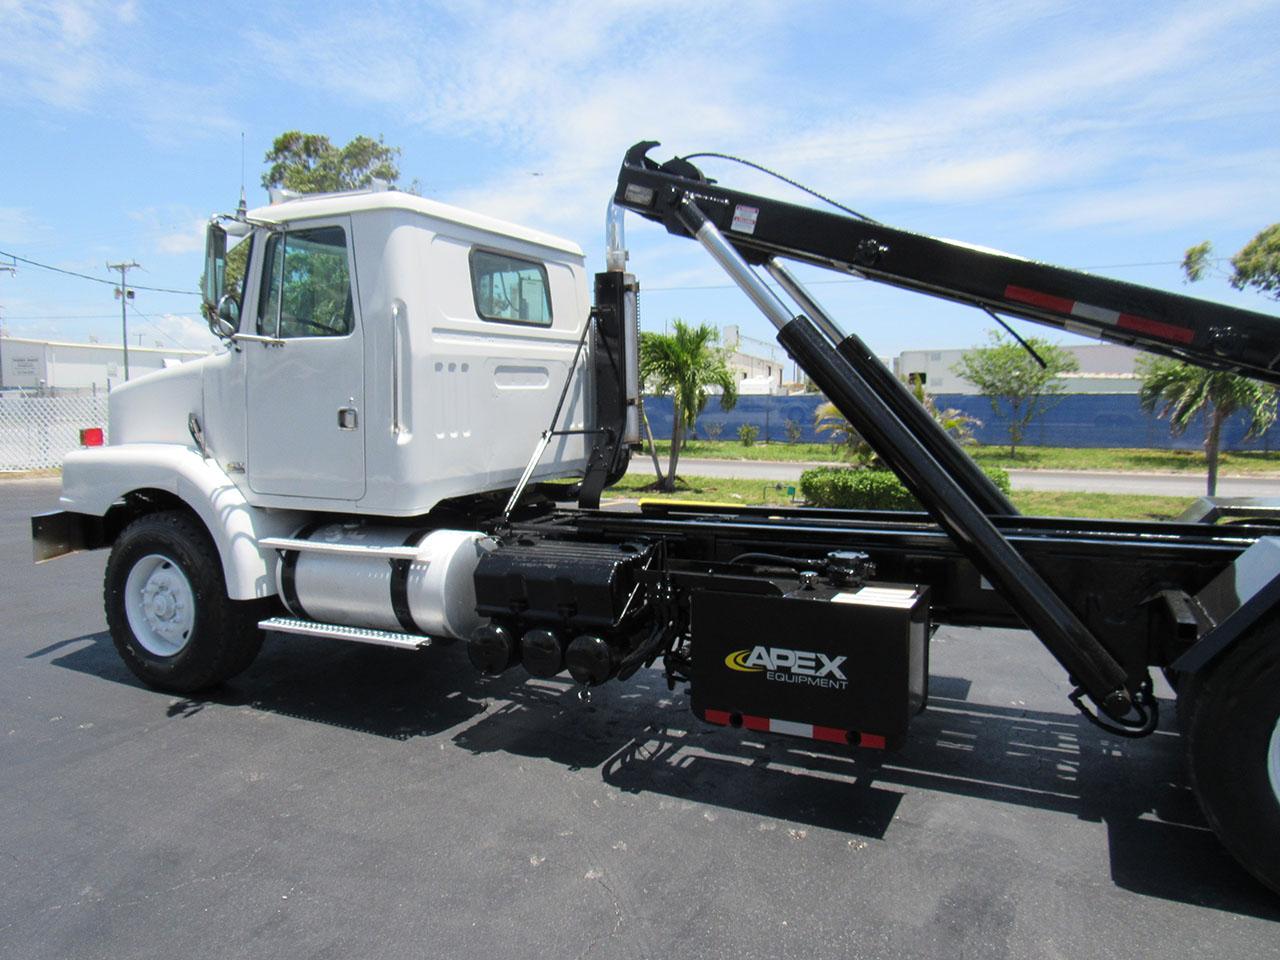 used 2000 Volvo WG64 in West Palm Beach, FL